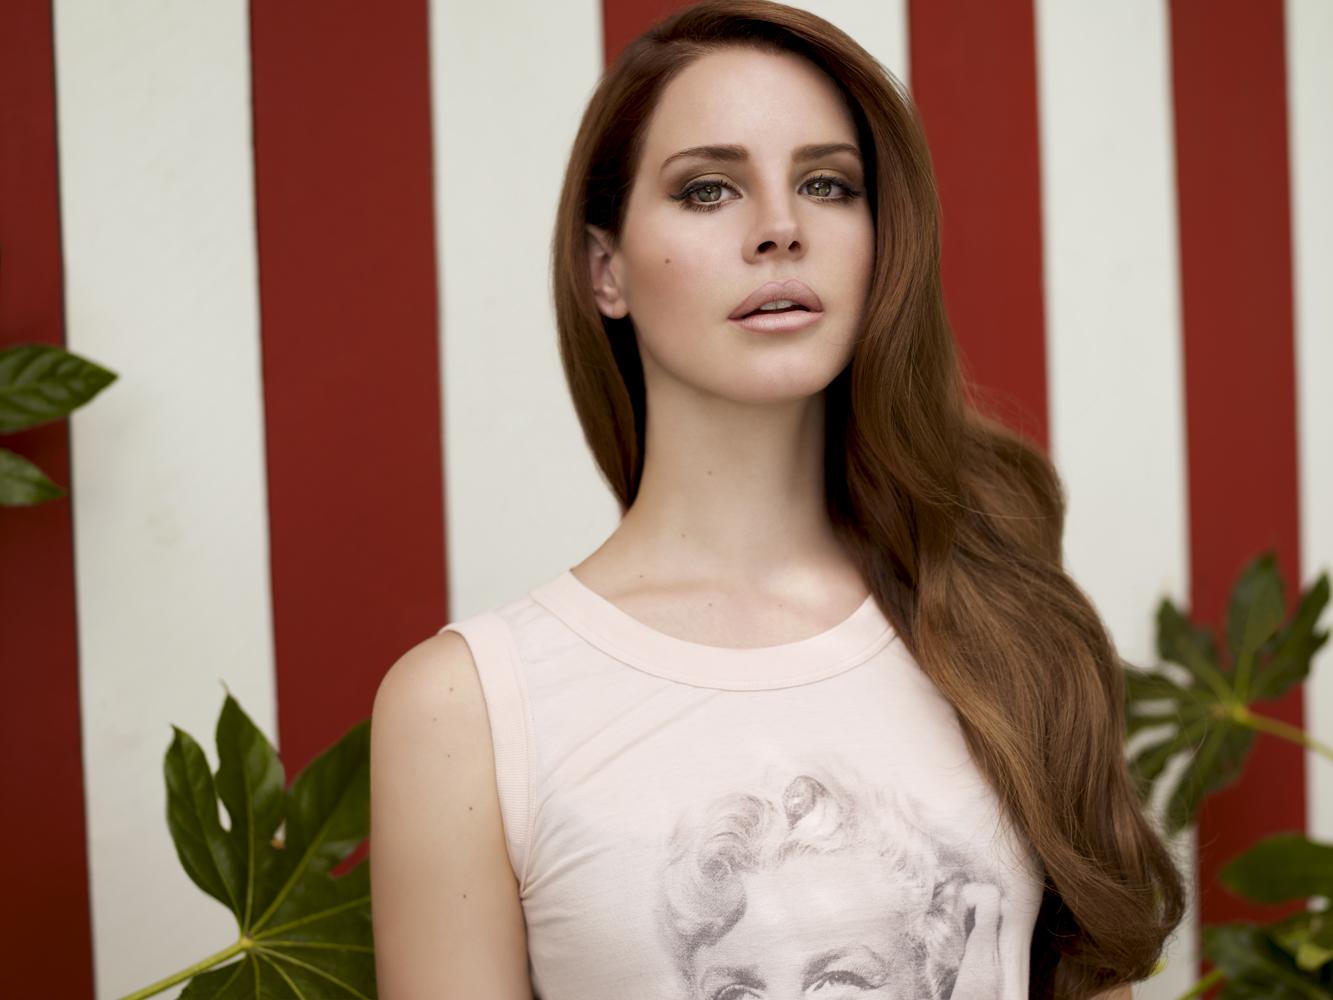 Lana, del, rey Wikipedie